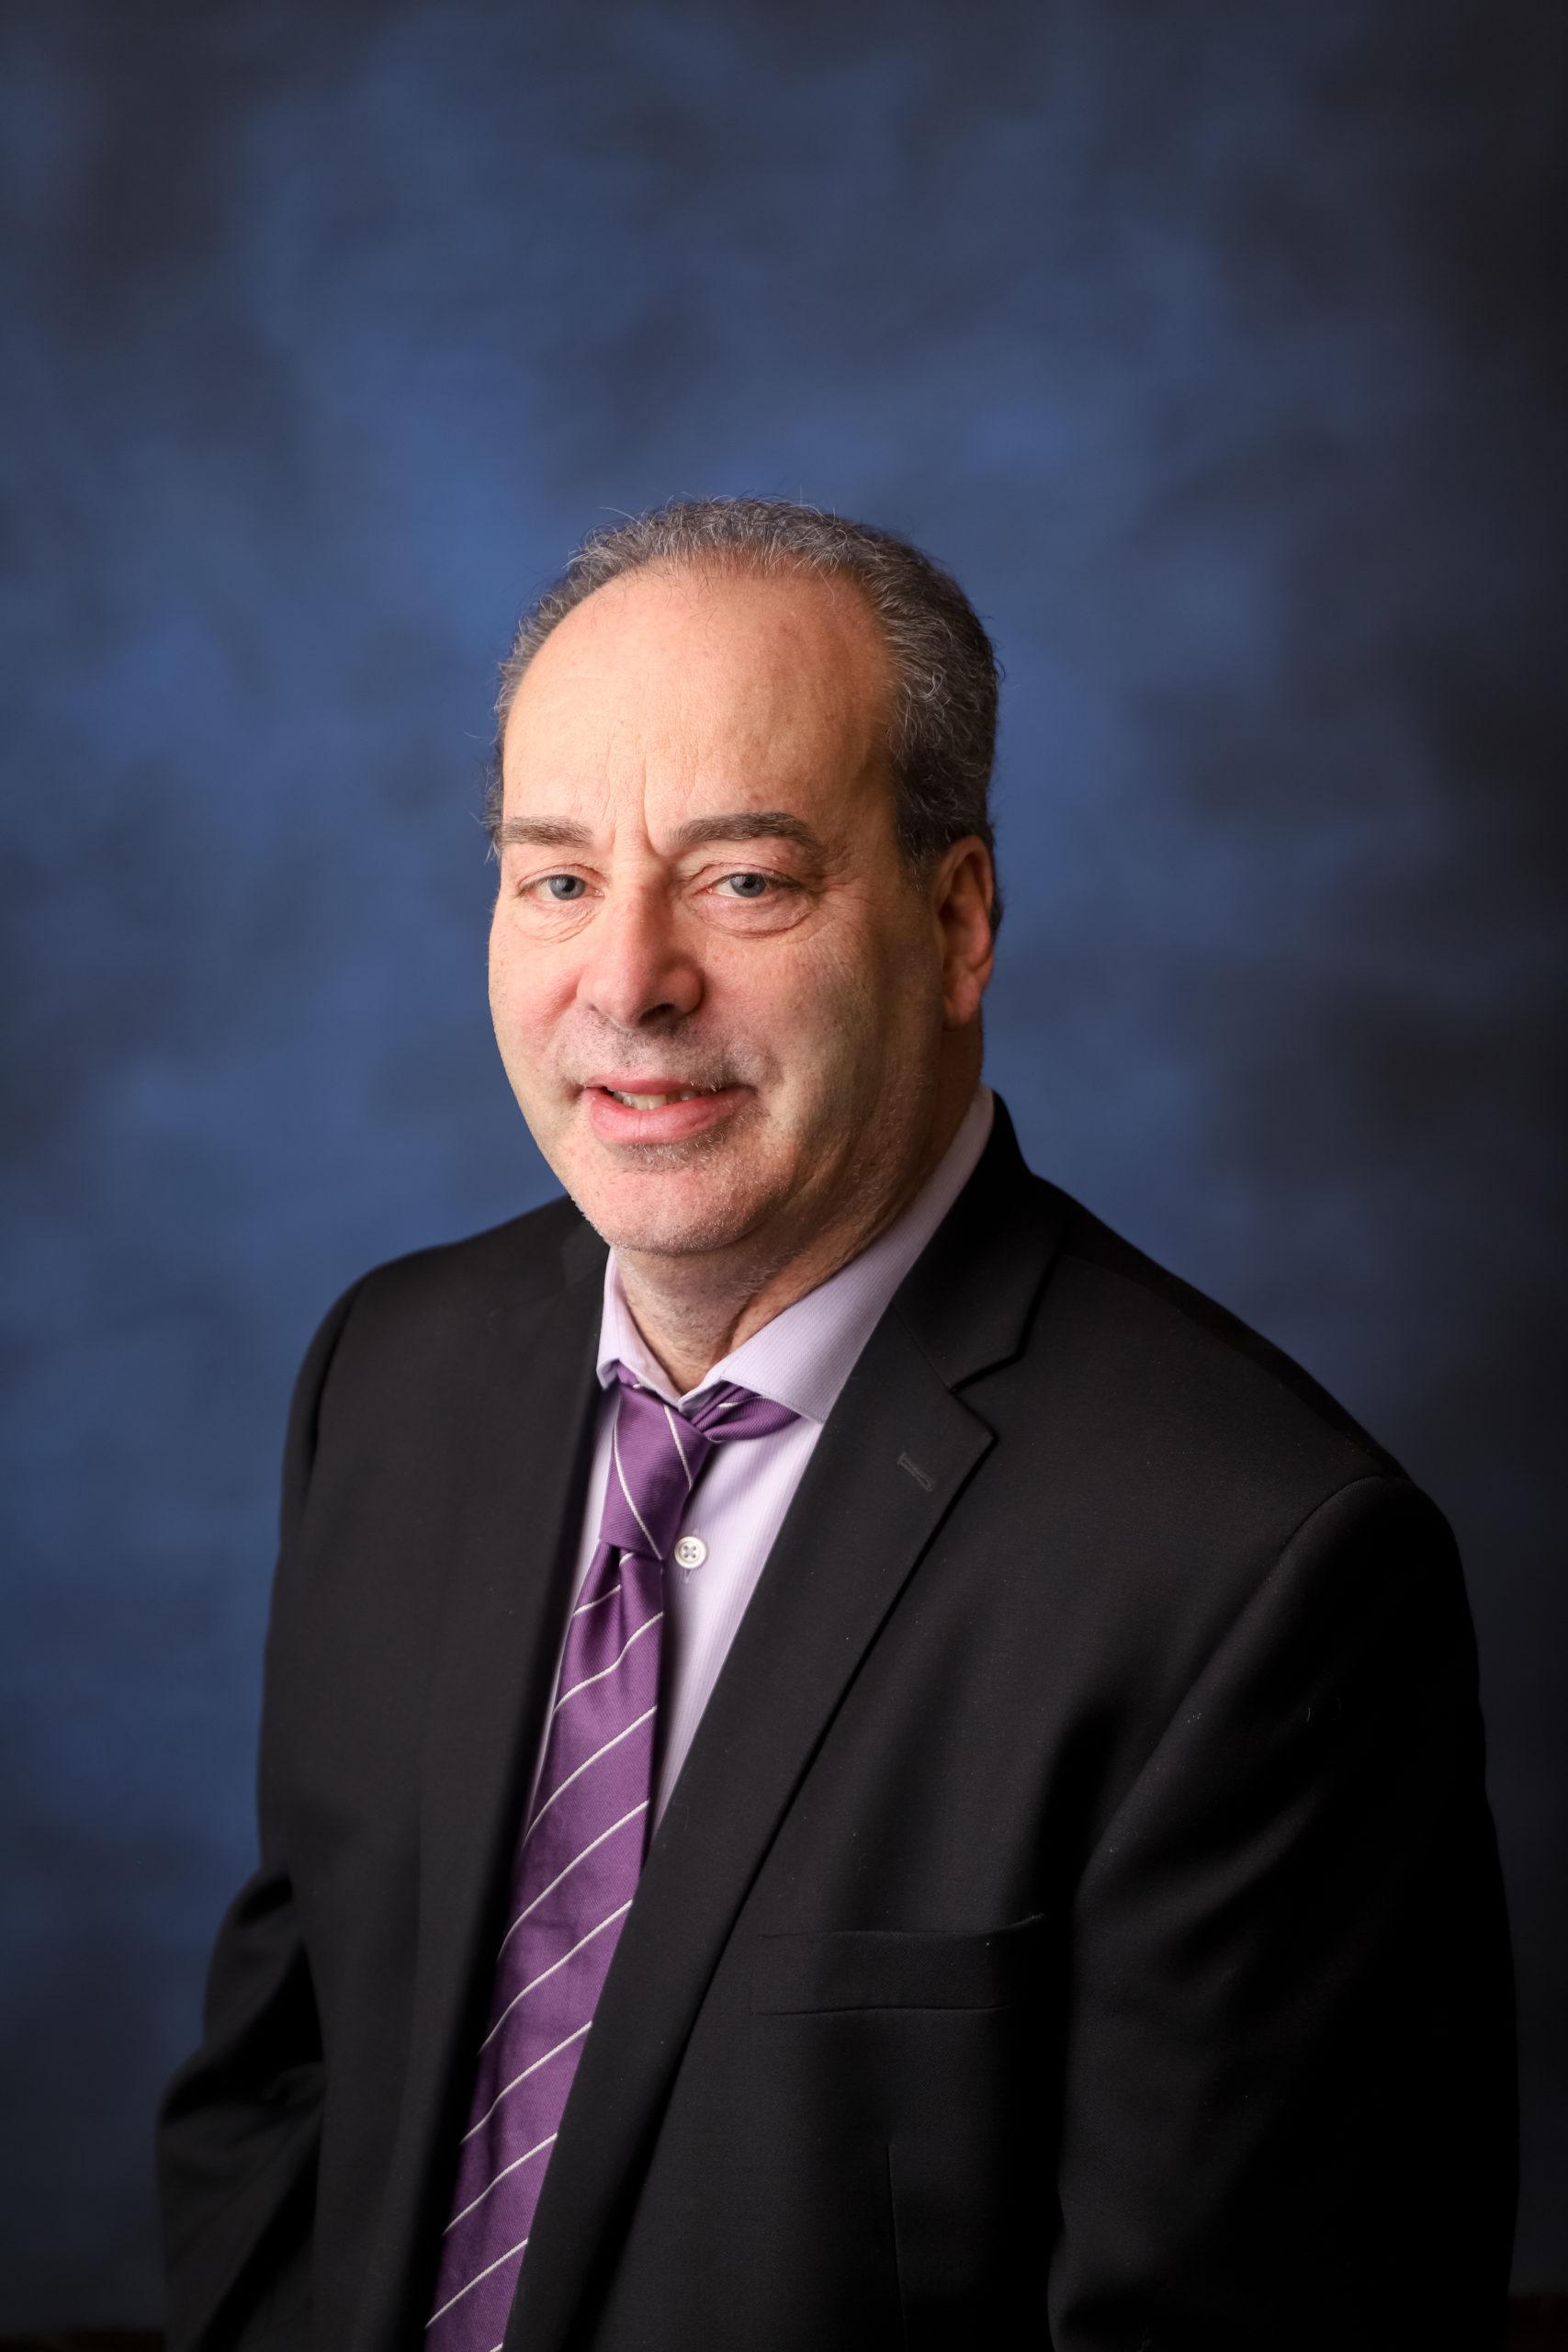 Dr. Richard Castaldo